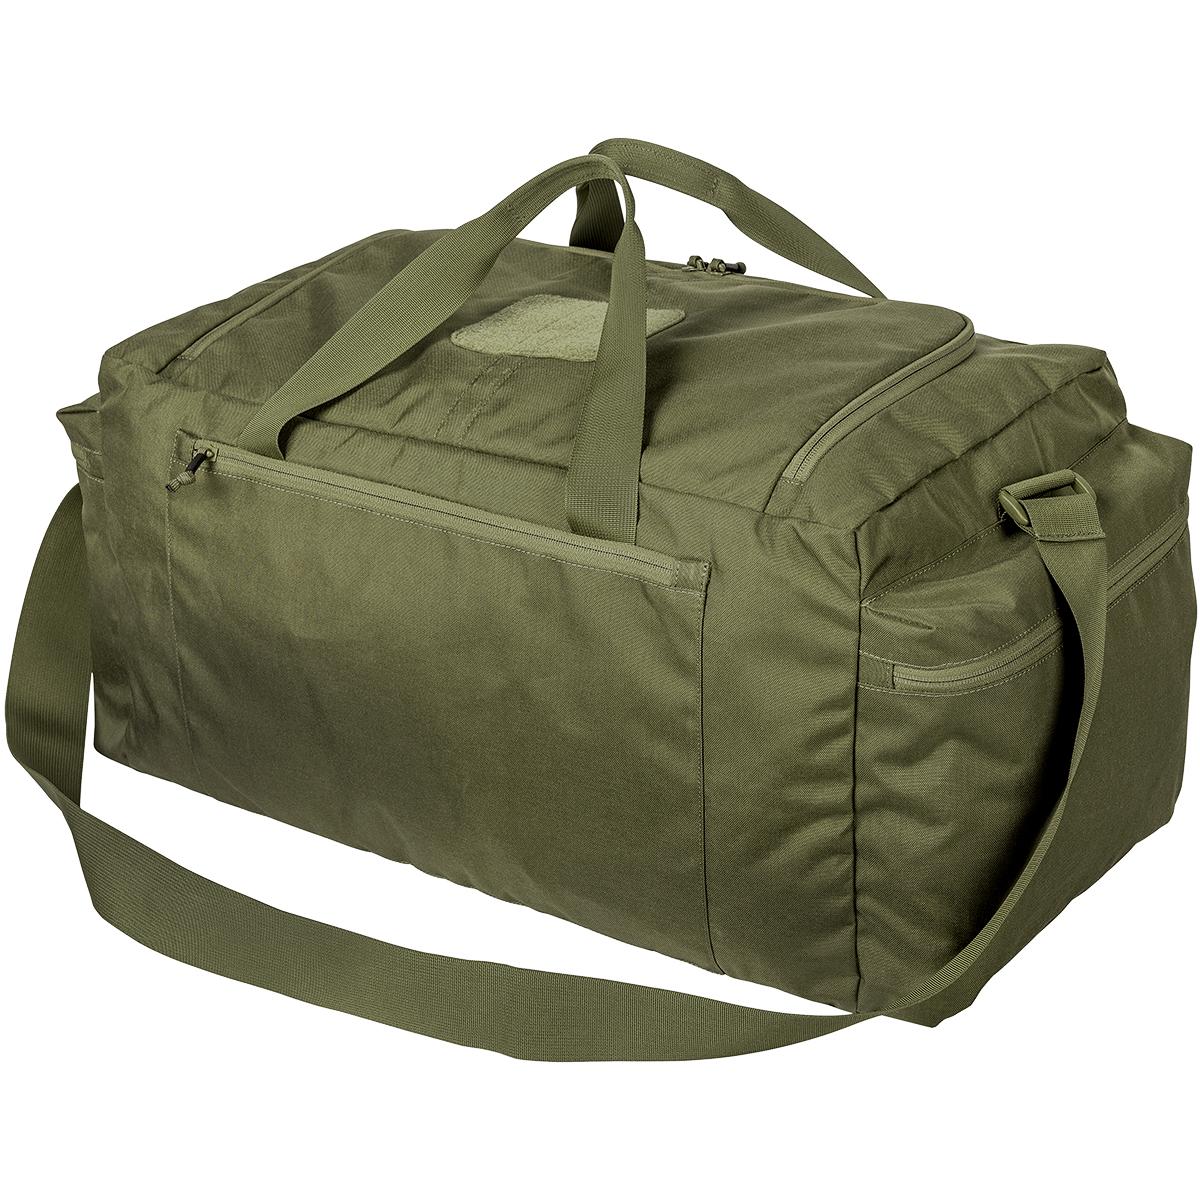 Details about Helikon Urban Training Bag Tactical Work Gym Sport Cordura  Messenger Olive Green